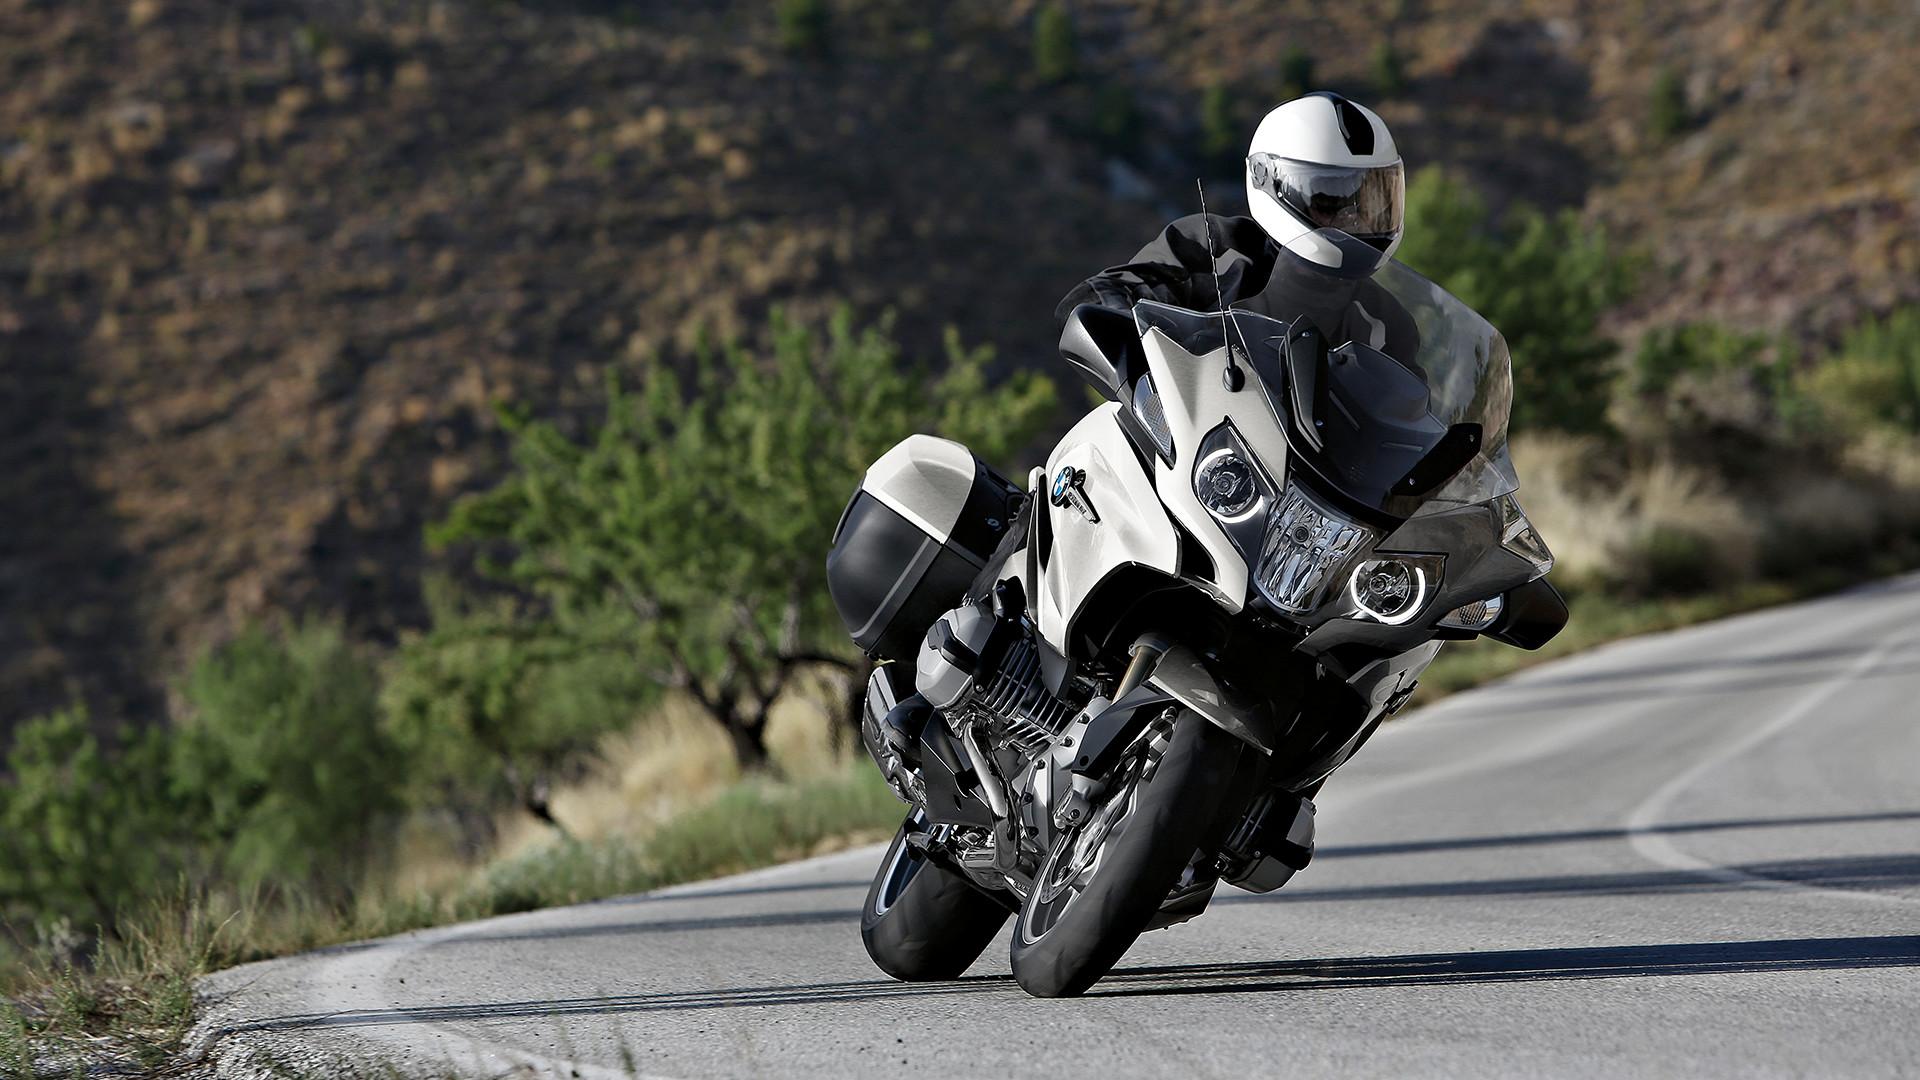 2018 Bmw R 1200 Rt Bmw Motorcycles Of Ventura County Newbury